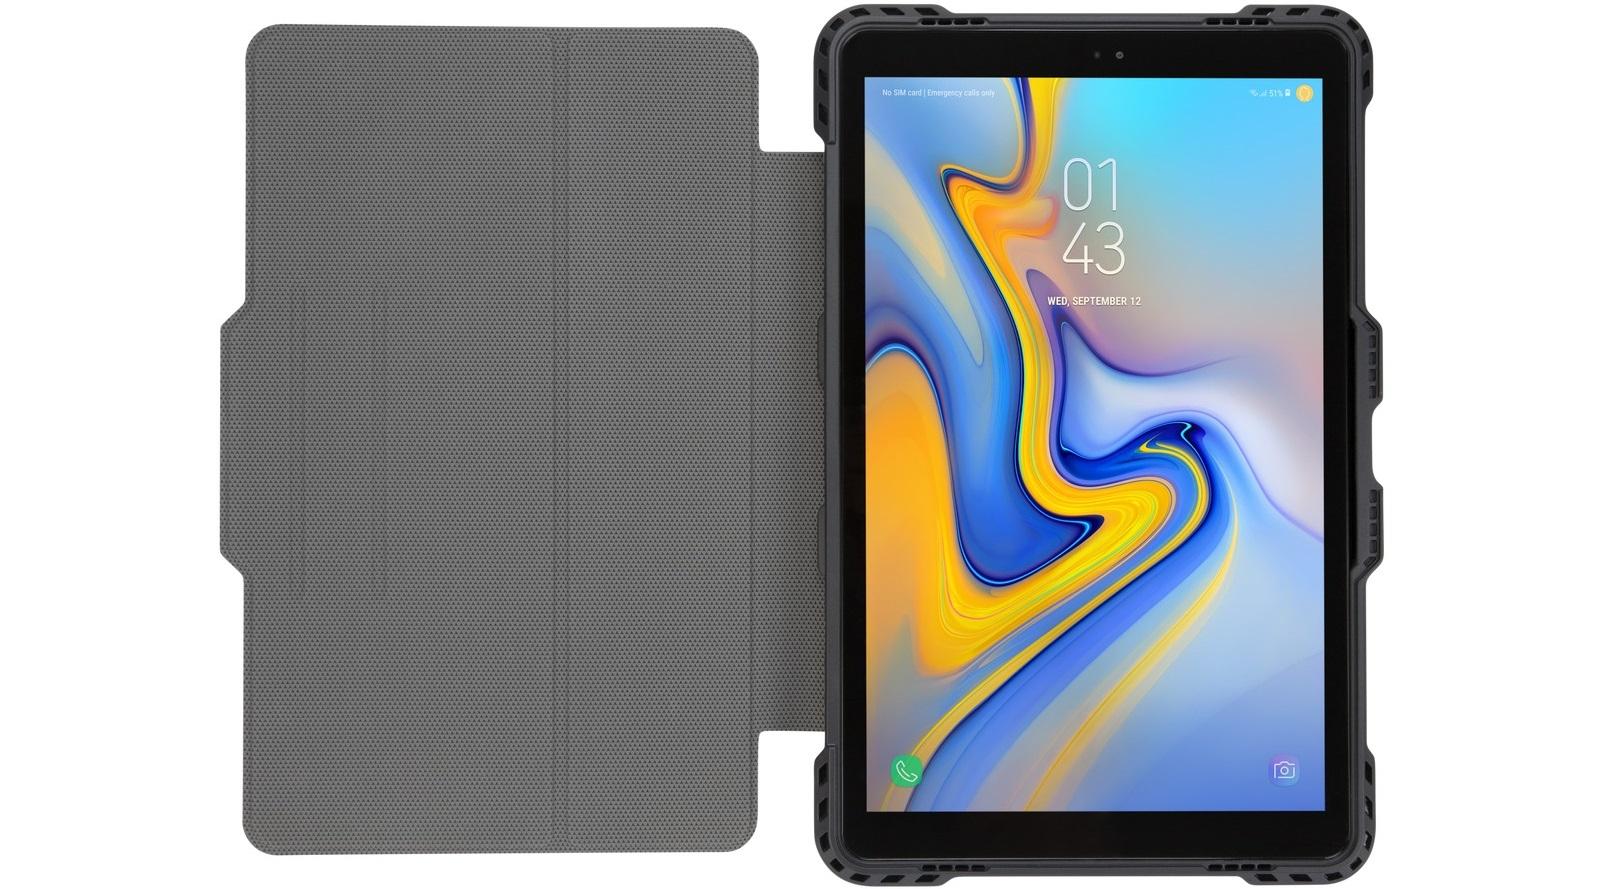 2649110eb3c Buy Targus Protek Rotating Case for Galaxy Tab A 10.5-inch 2018 | Harvey  Norman AU